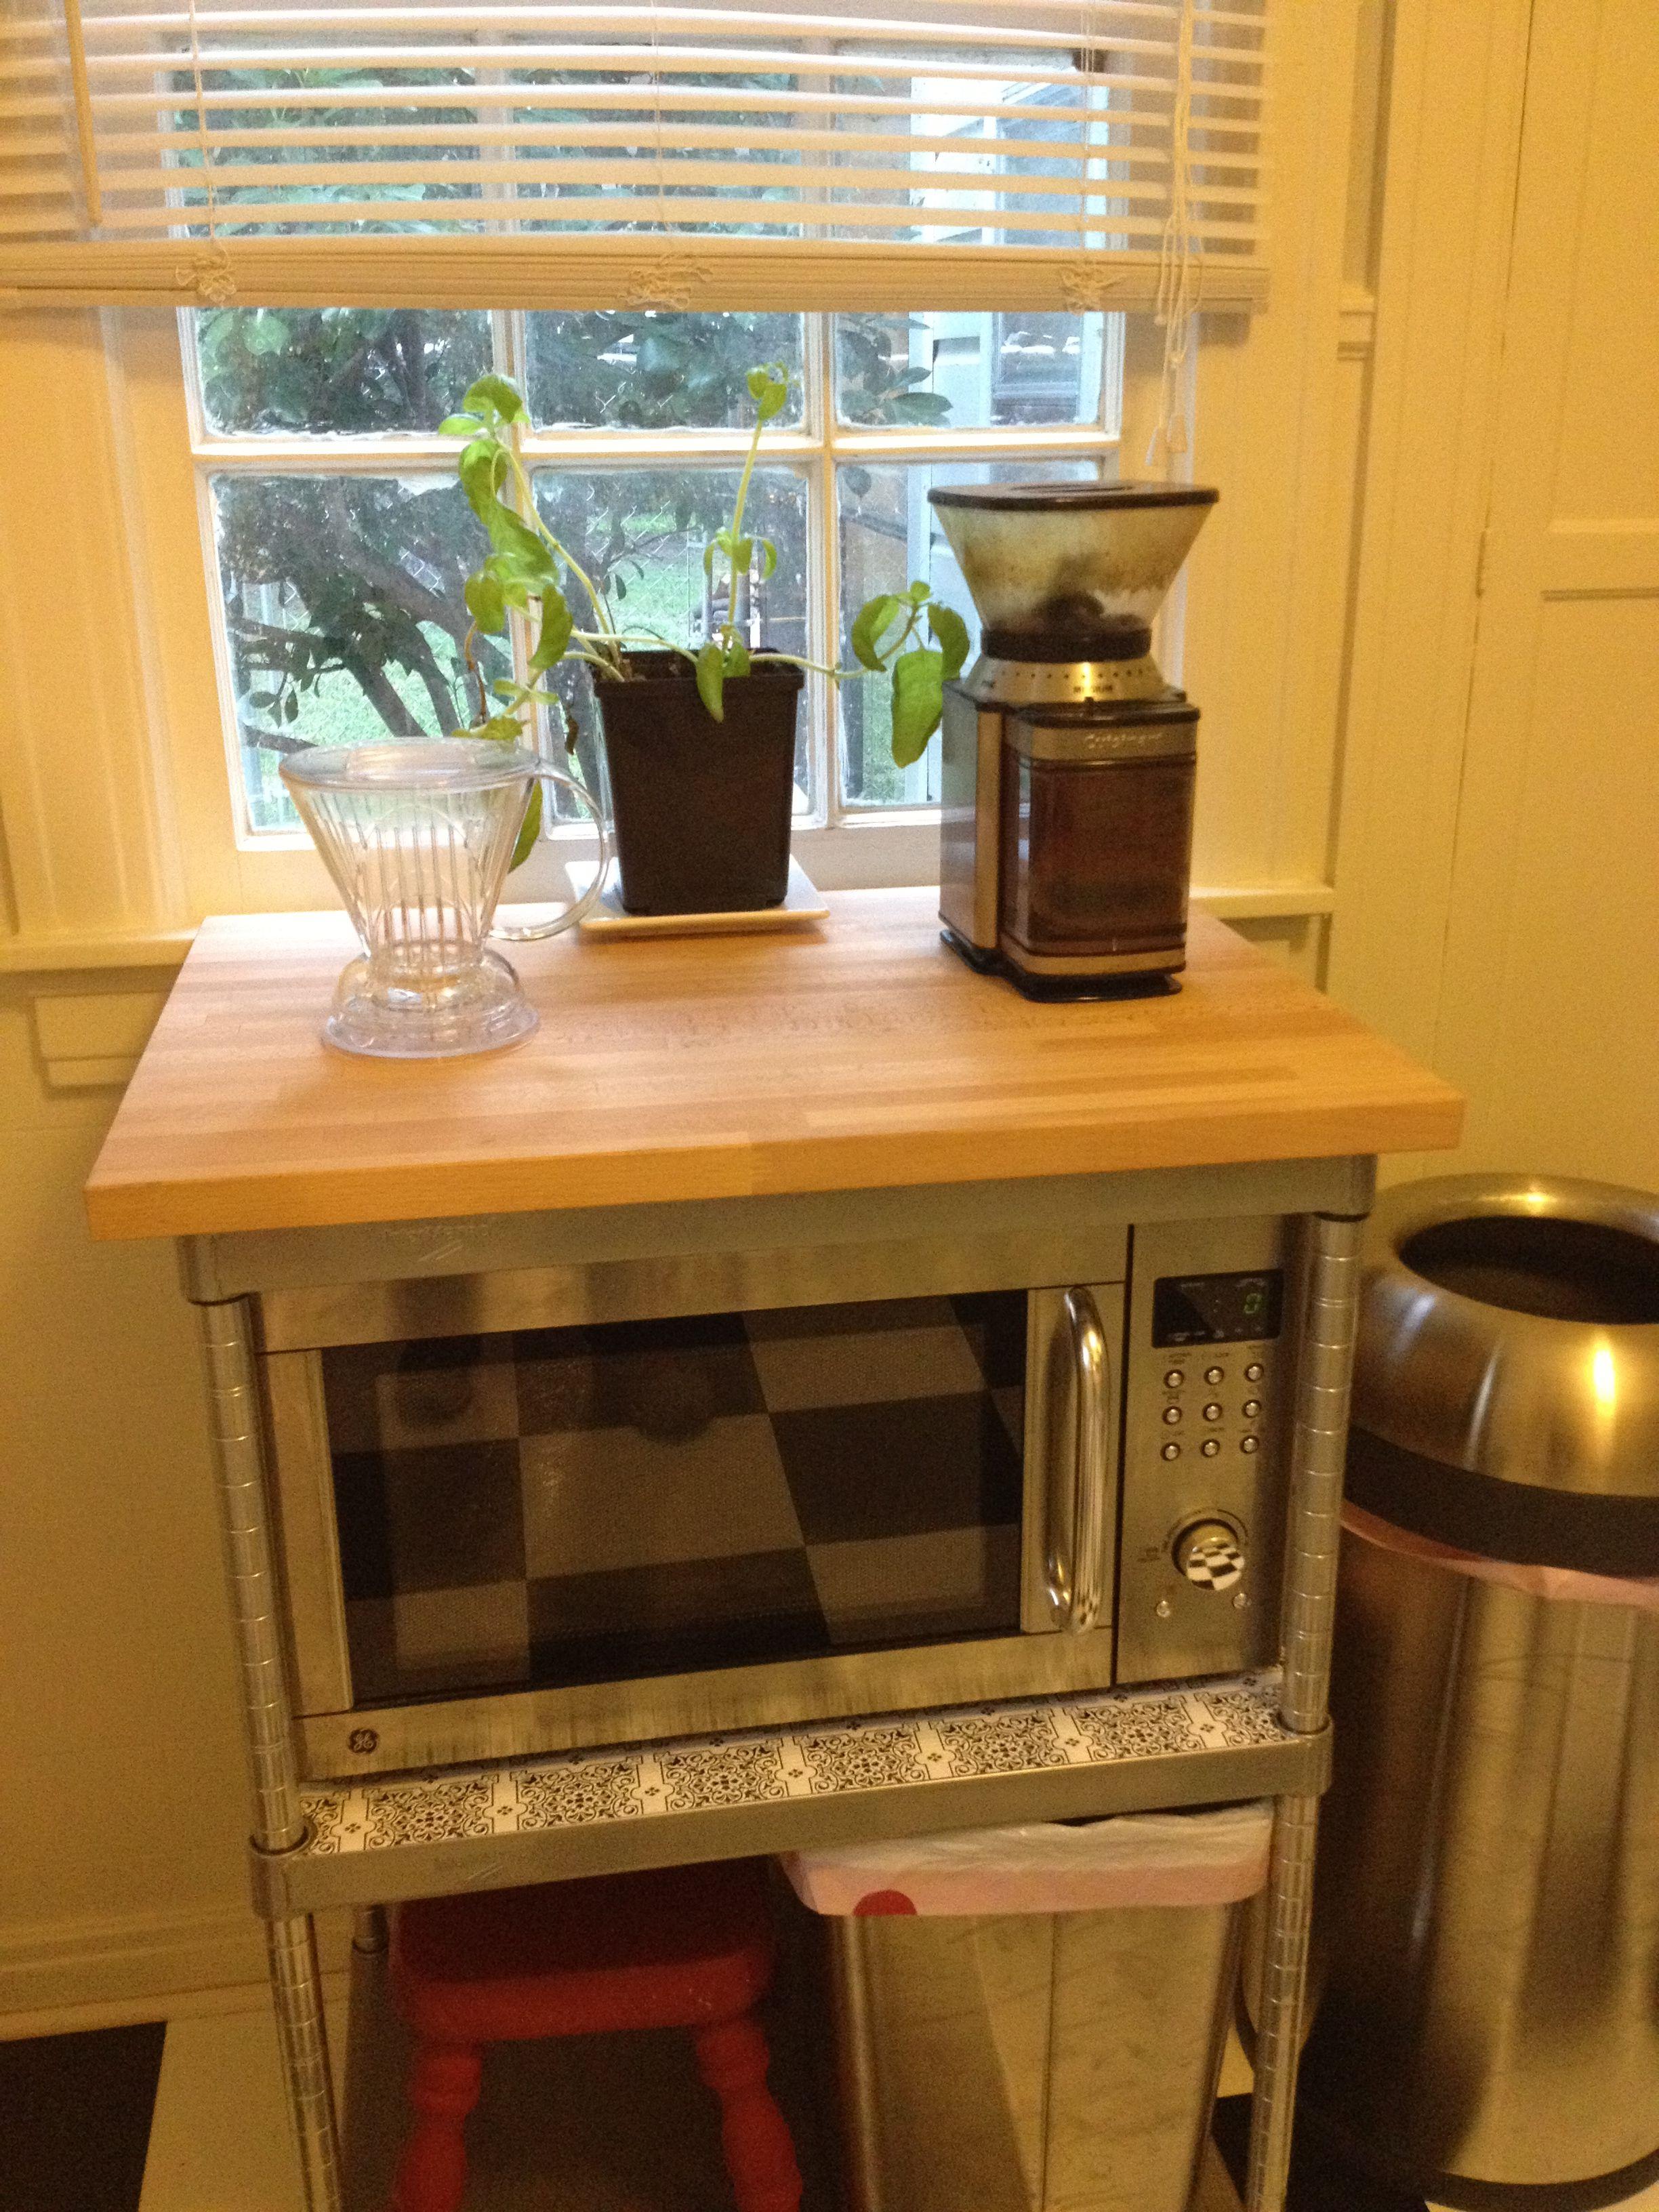 Microwave Standcoffee Station Retro Redo Vintage Kitchen Kitchen Retro Redo Retro Redo O